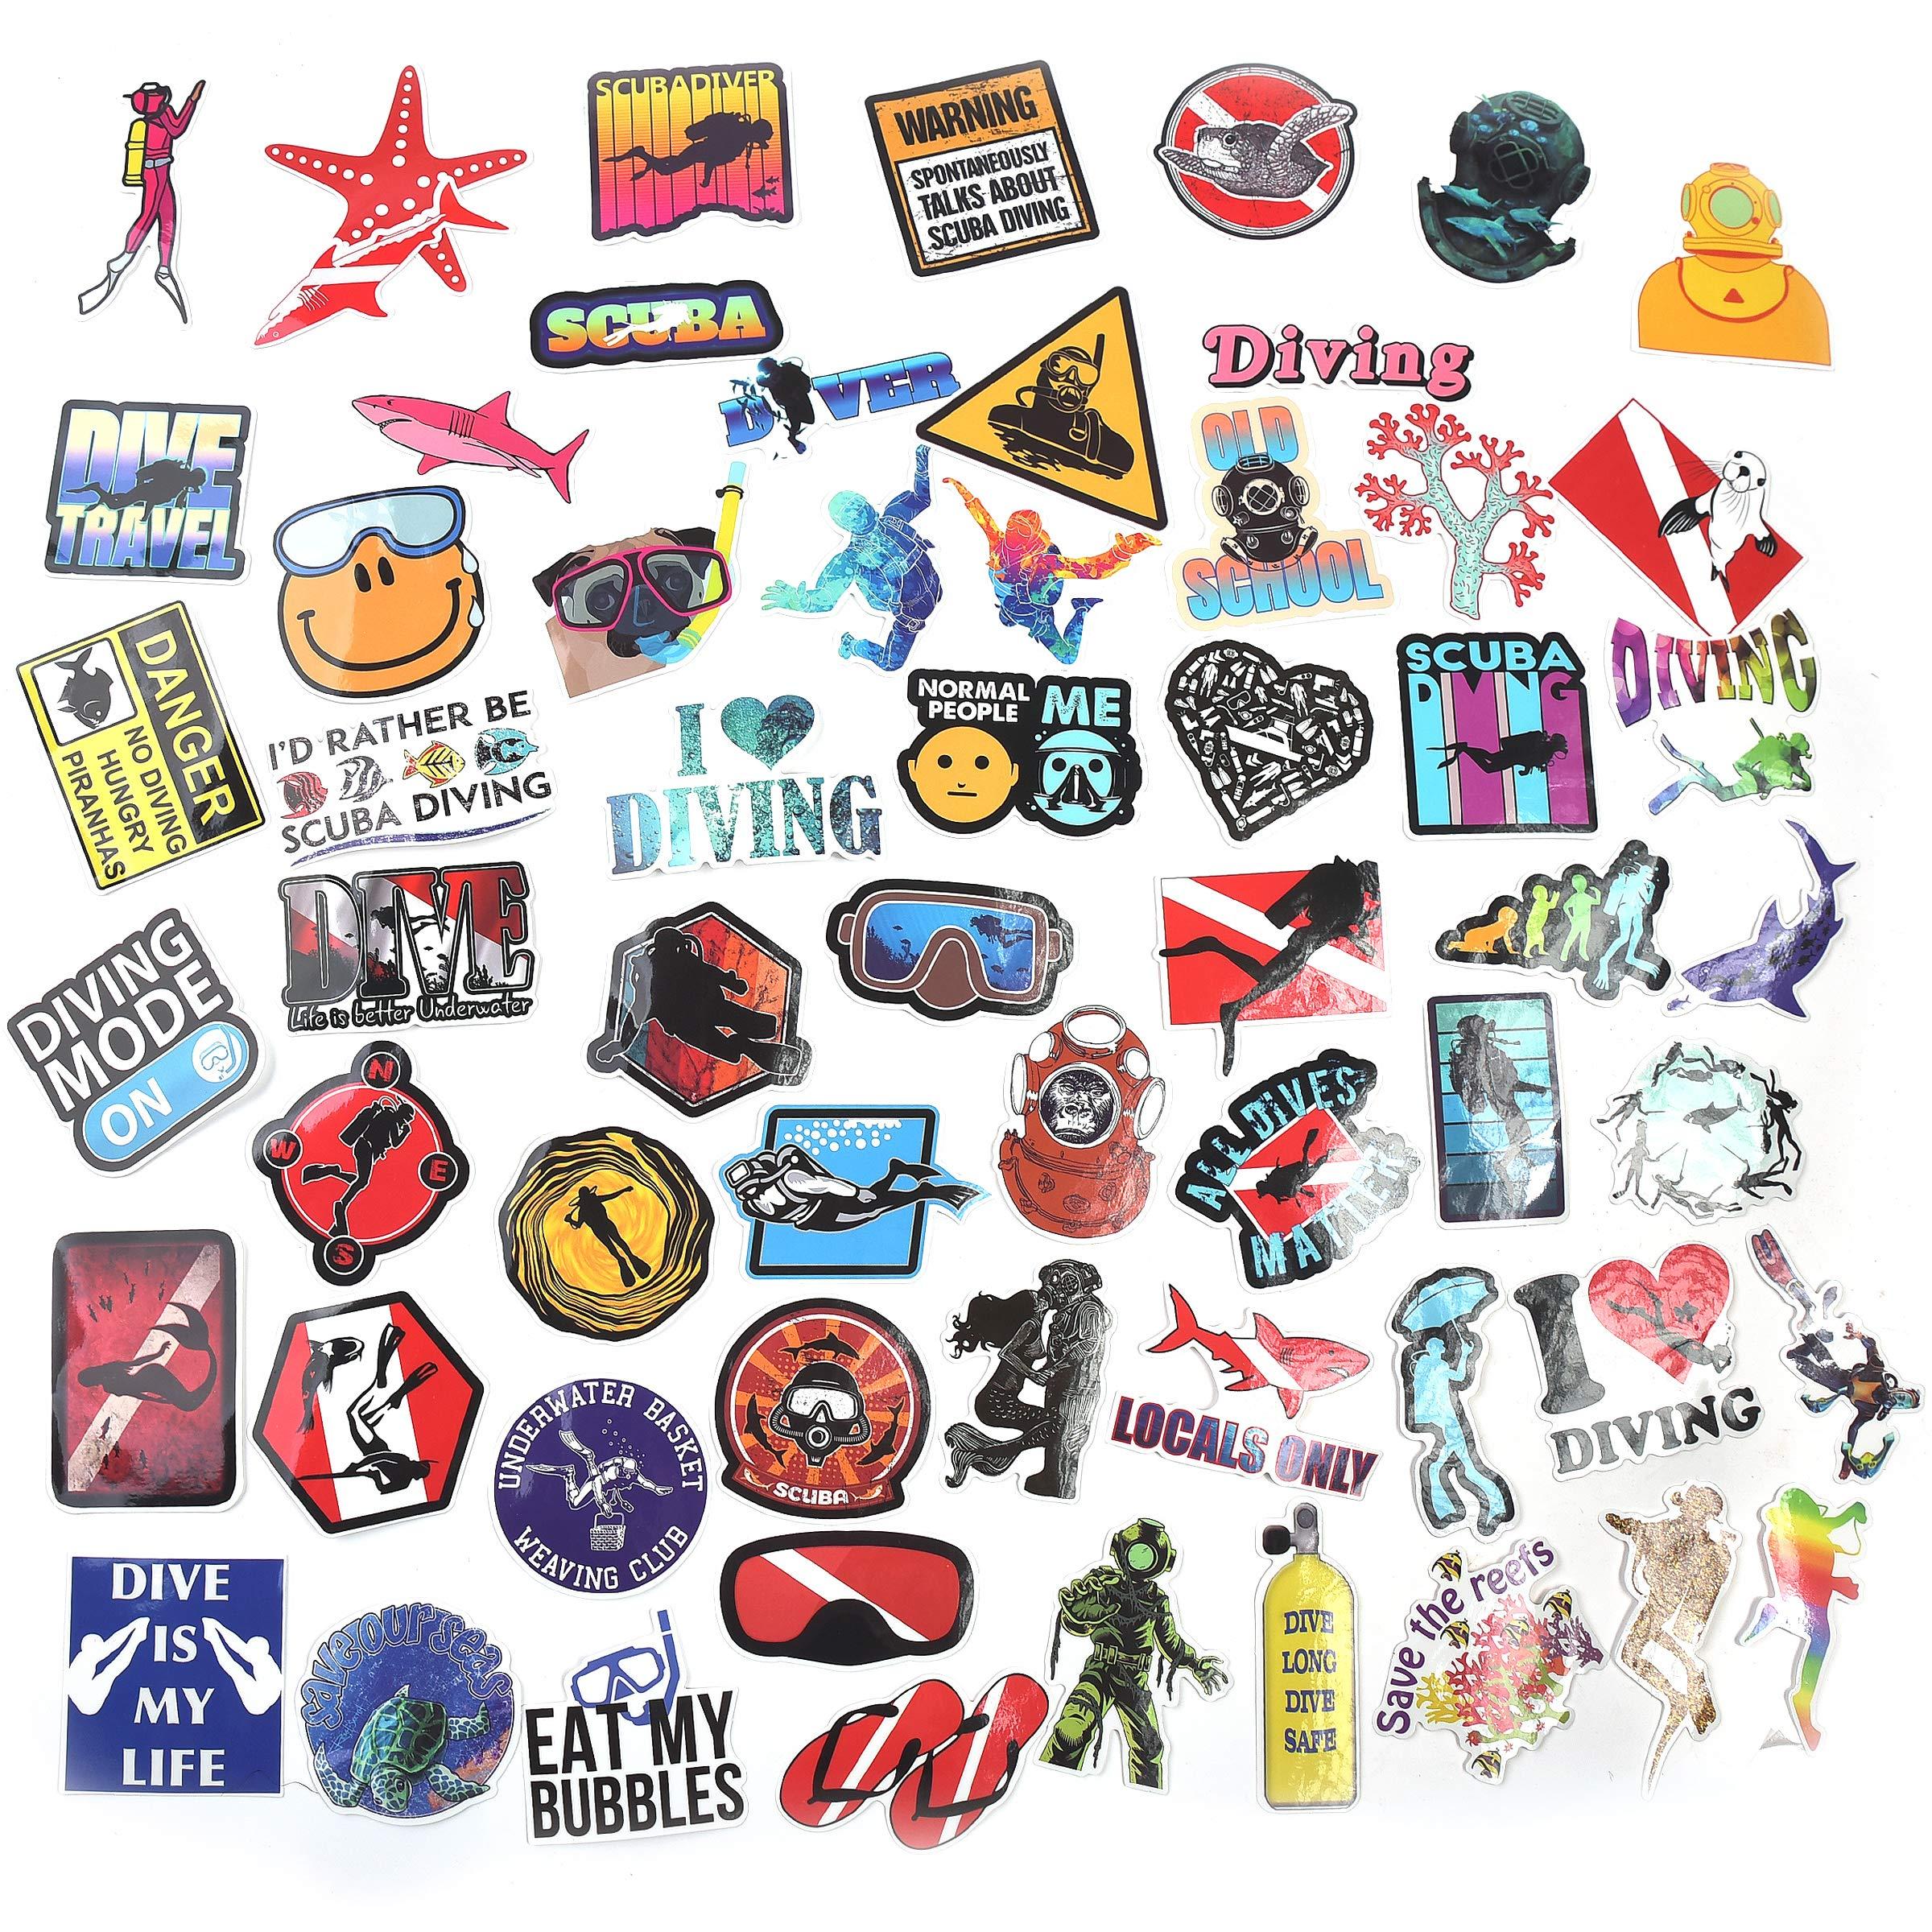 Mizzuco Vinyl Stickers Waterproof Diving Stickers 61 Pieces for Teens Girls Laptop Bumper Helmet Ipad Car Luggage Water Bottle (231)